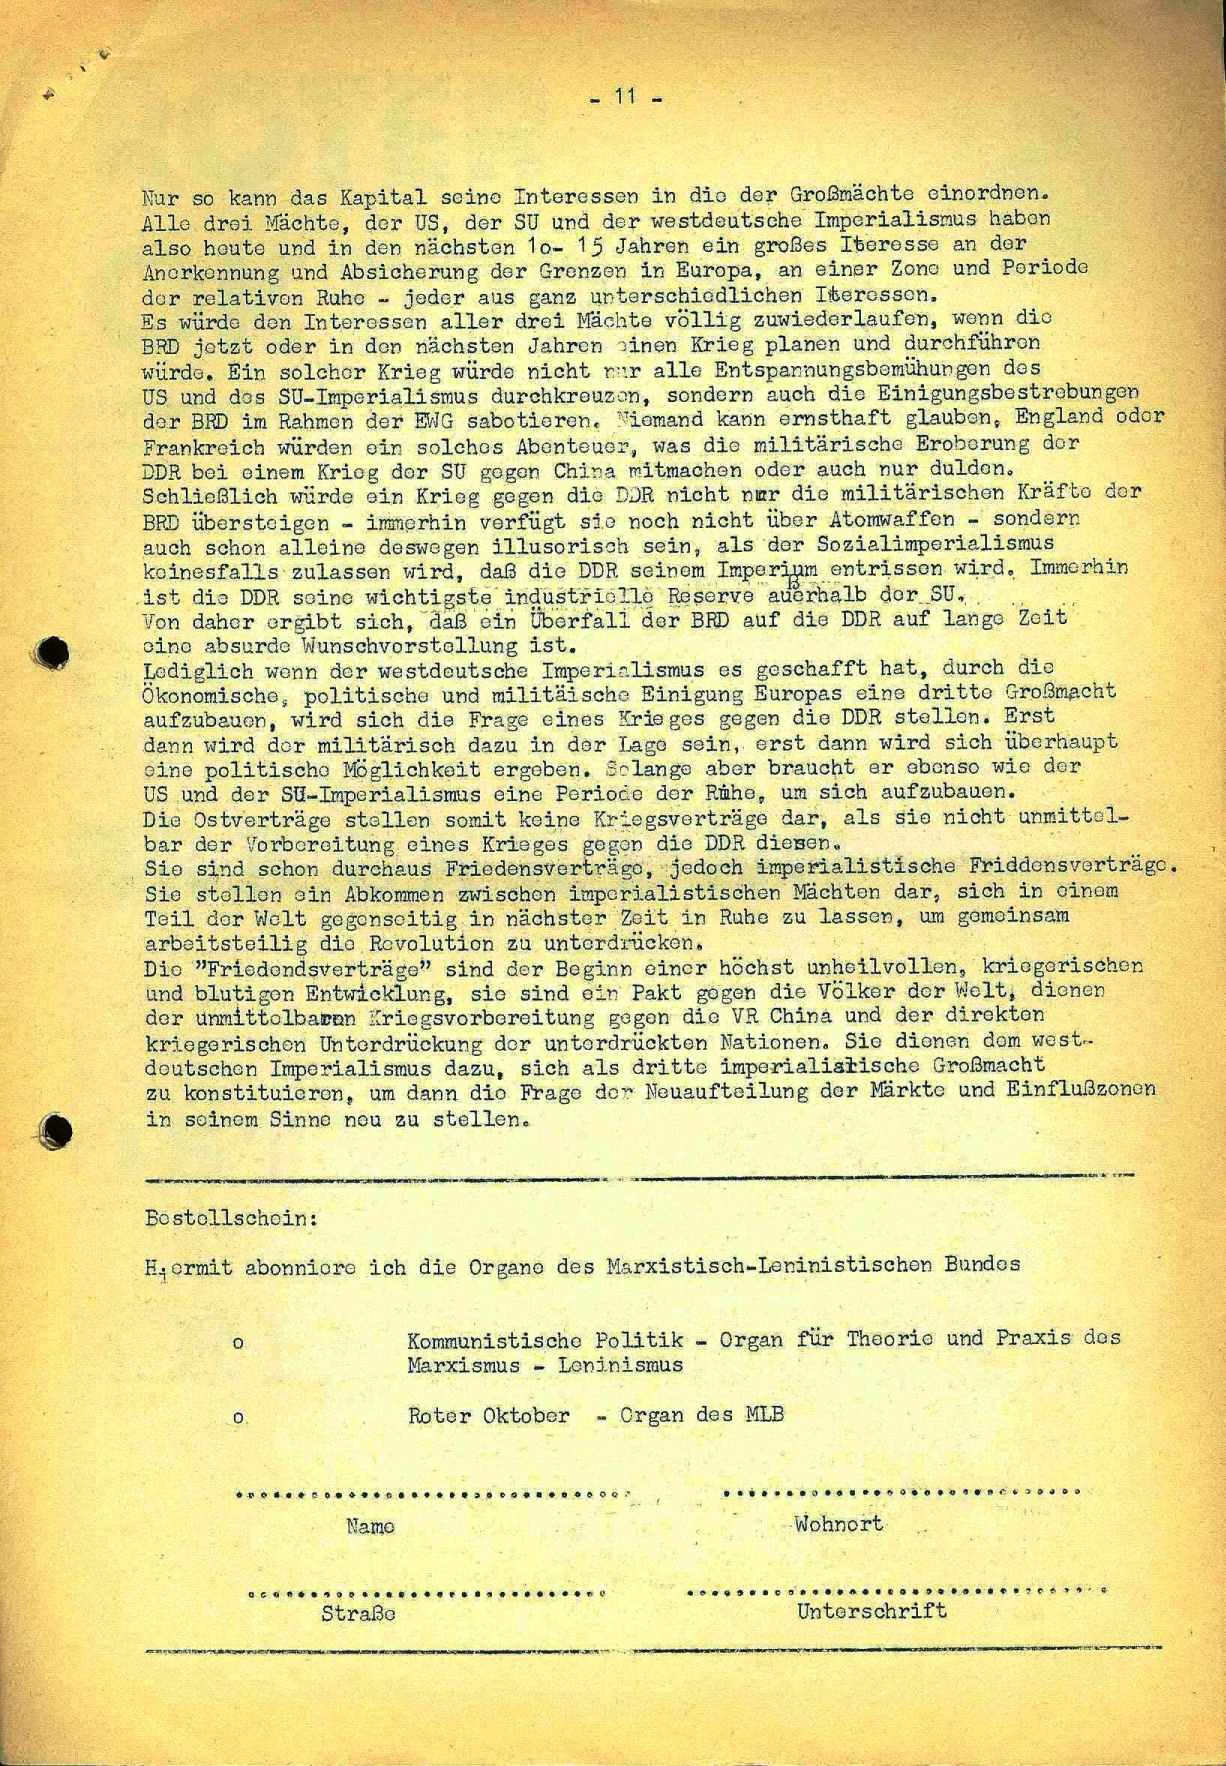 Weinfurth145